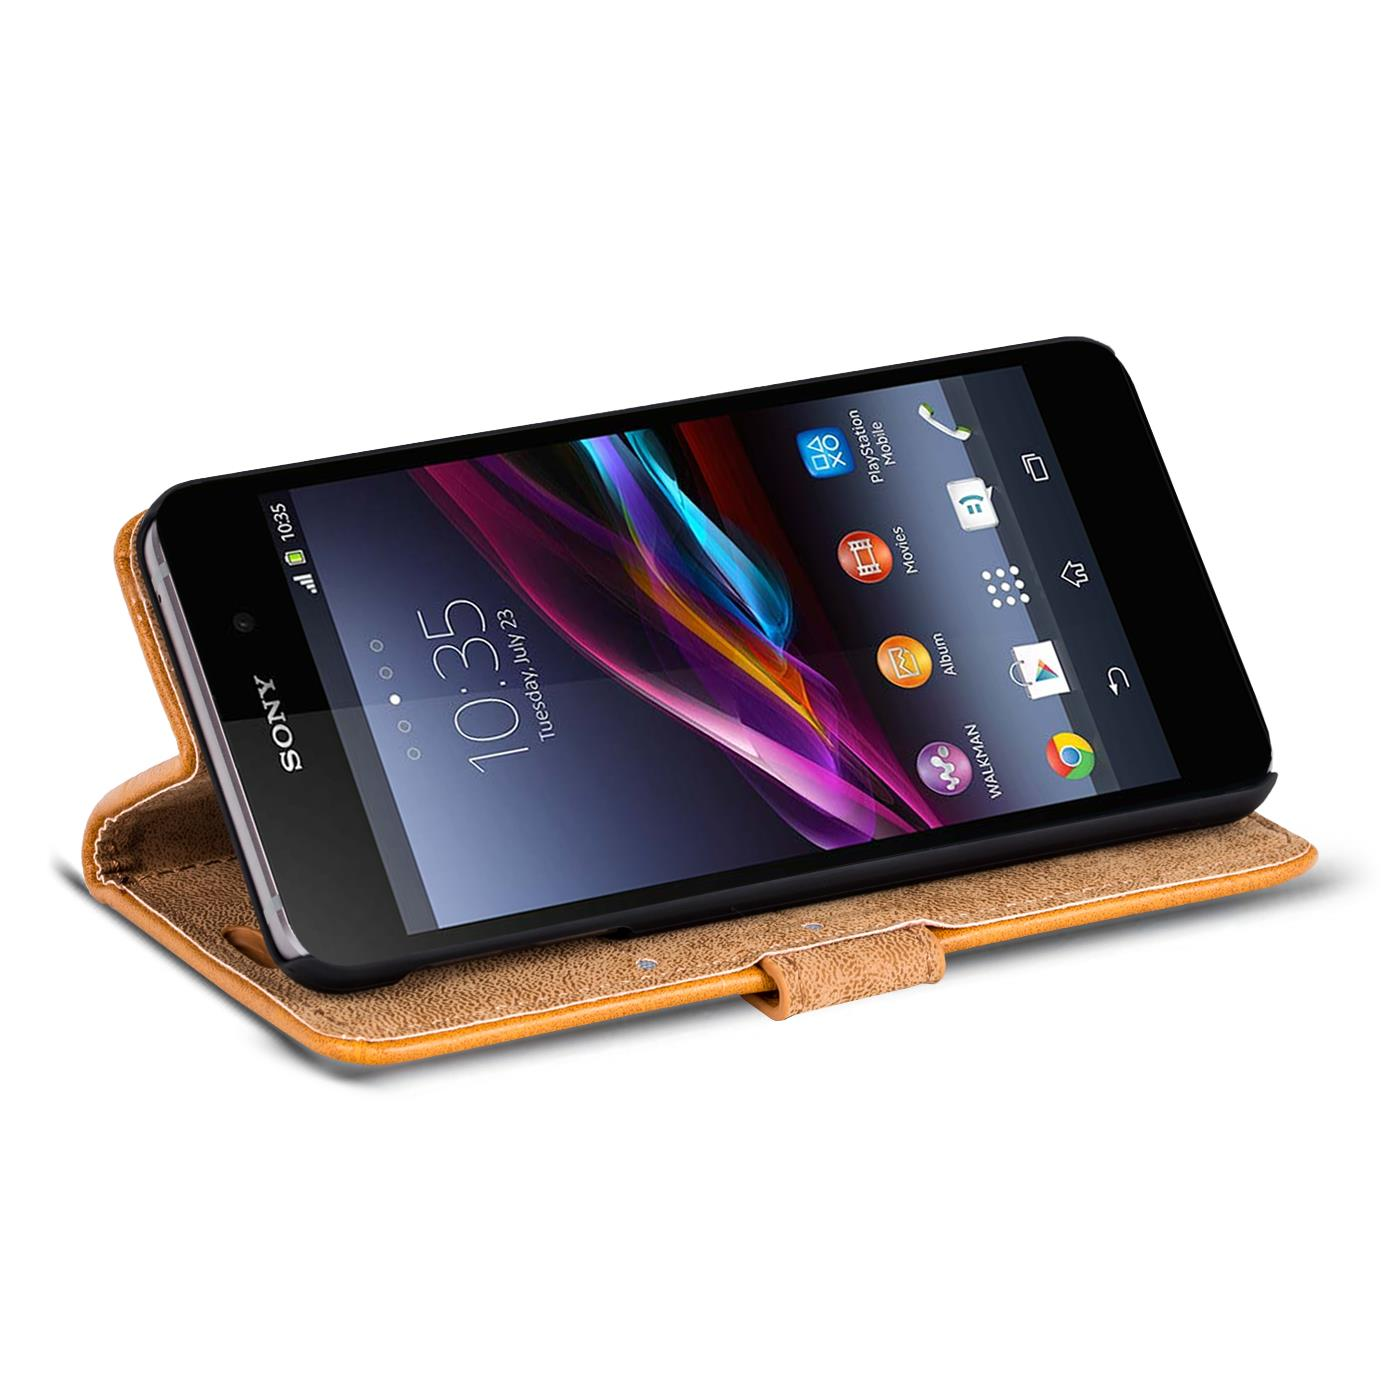 Phone Case Sony Xperia Z1 Compact Flip Cover CaseXperia Z1 Protective Case